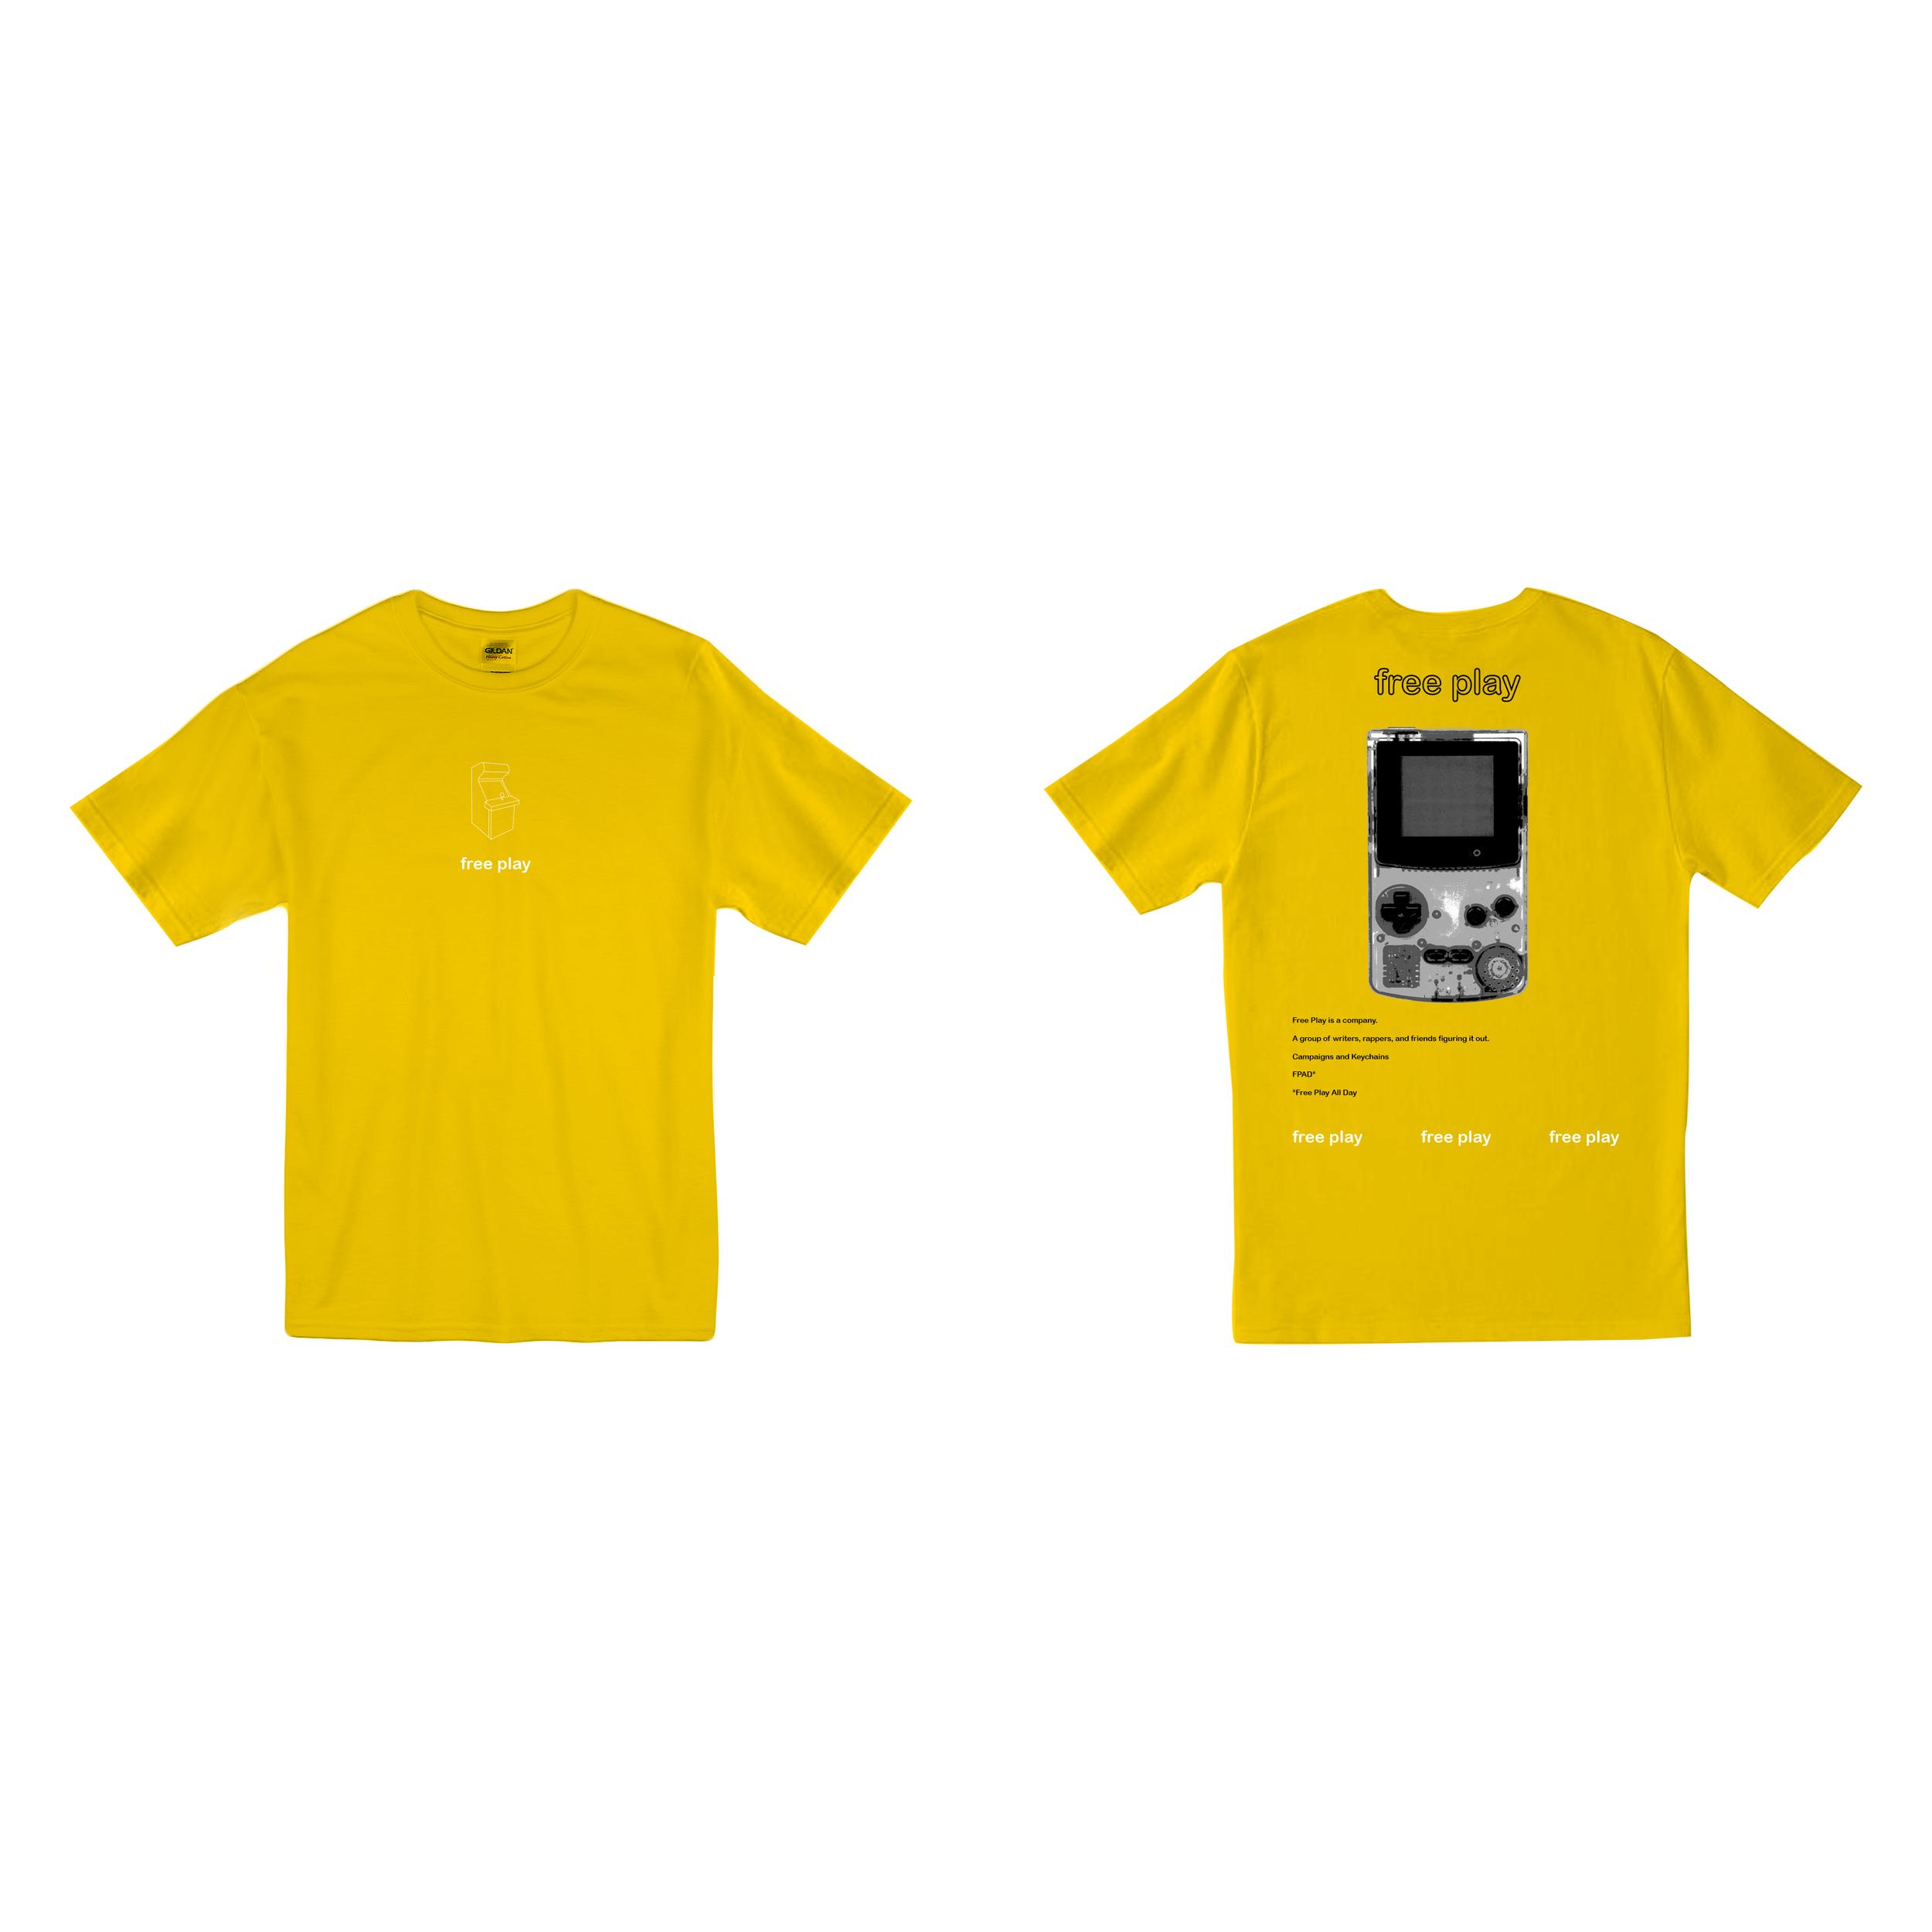 shirt 05.png